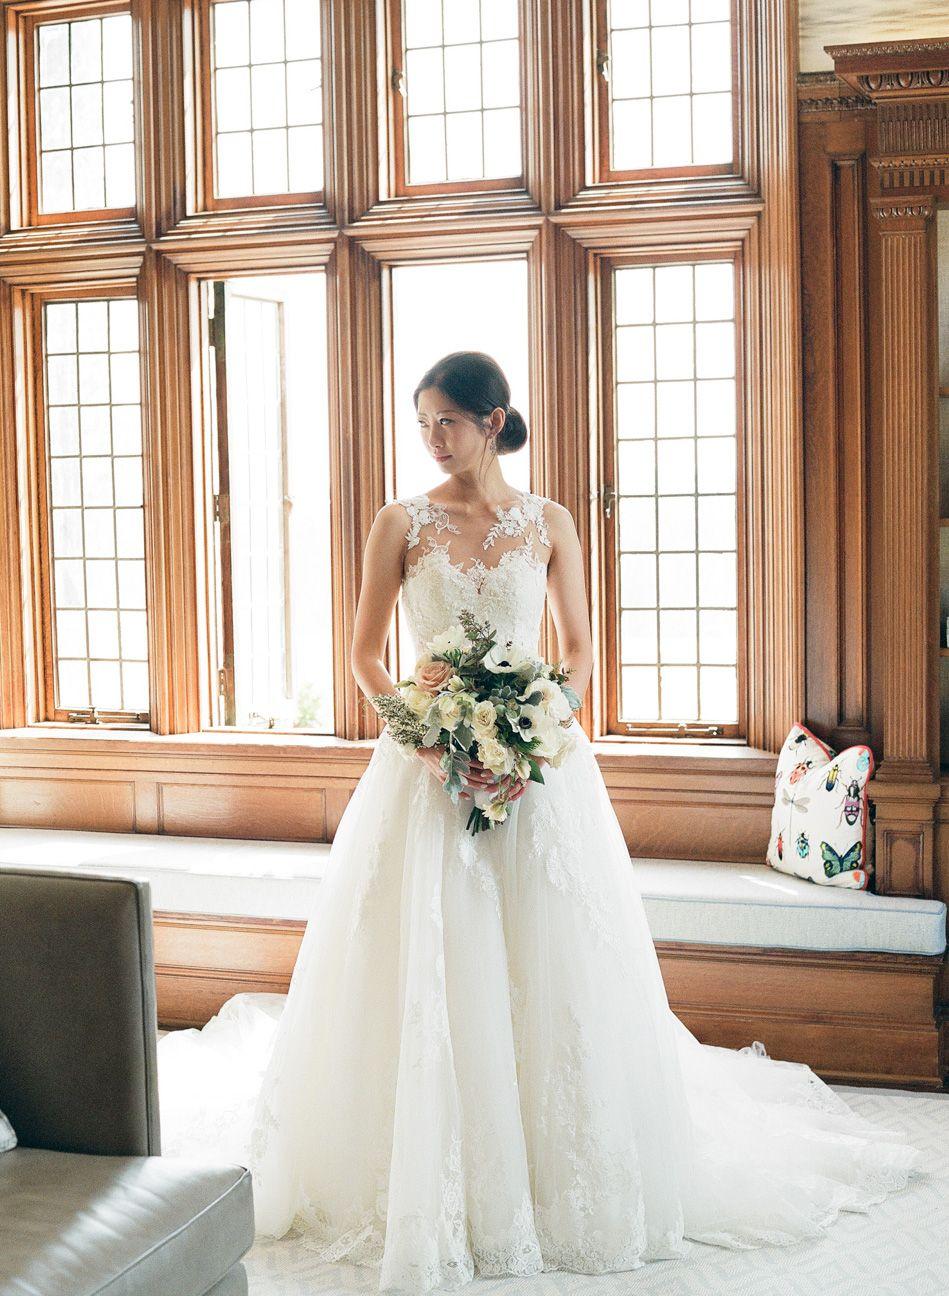 KarenHillPhotography-Zhu-Wedding-0178.jpg